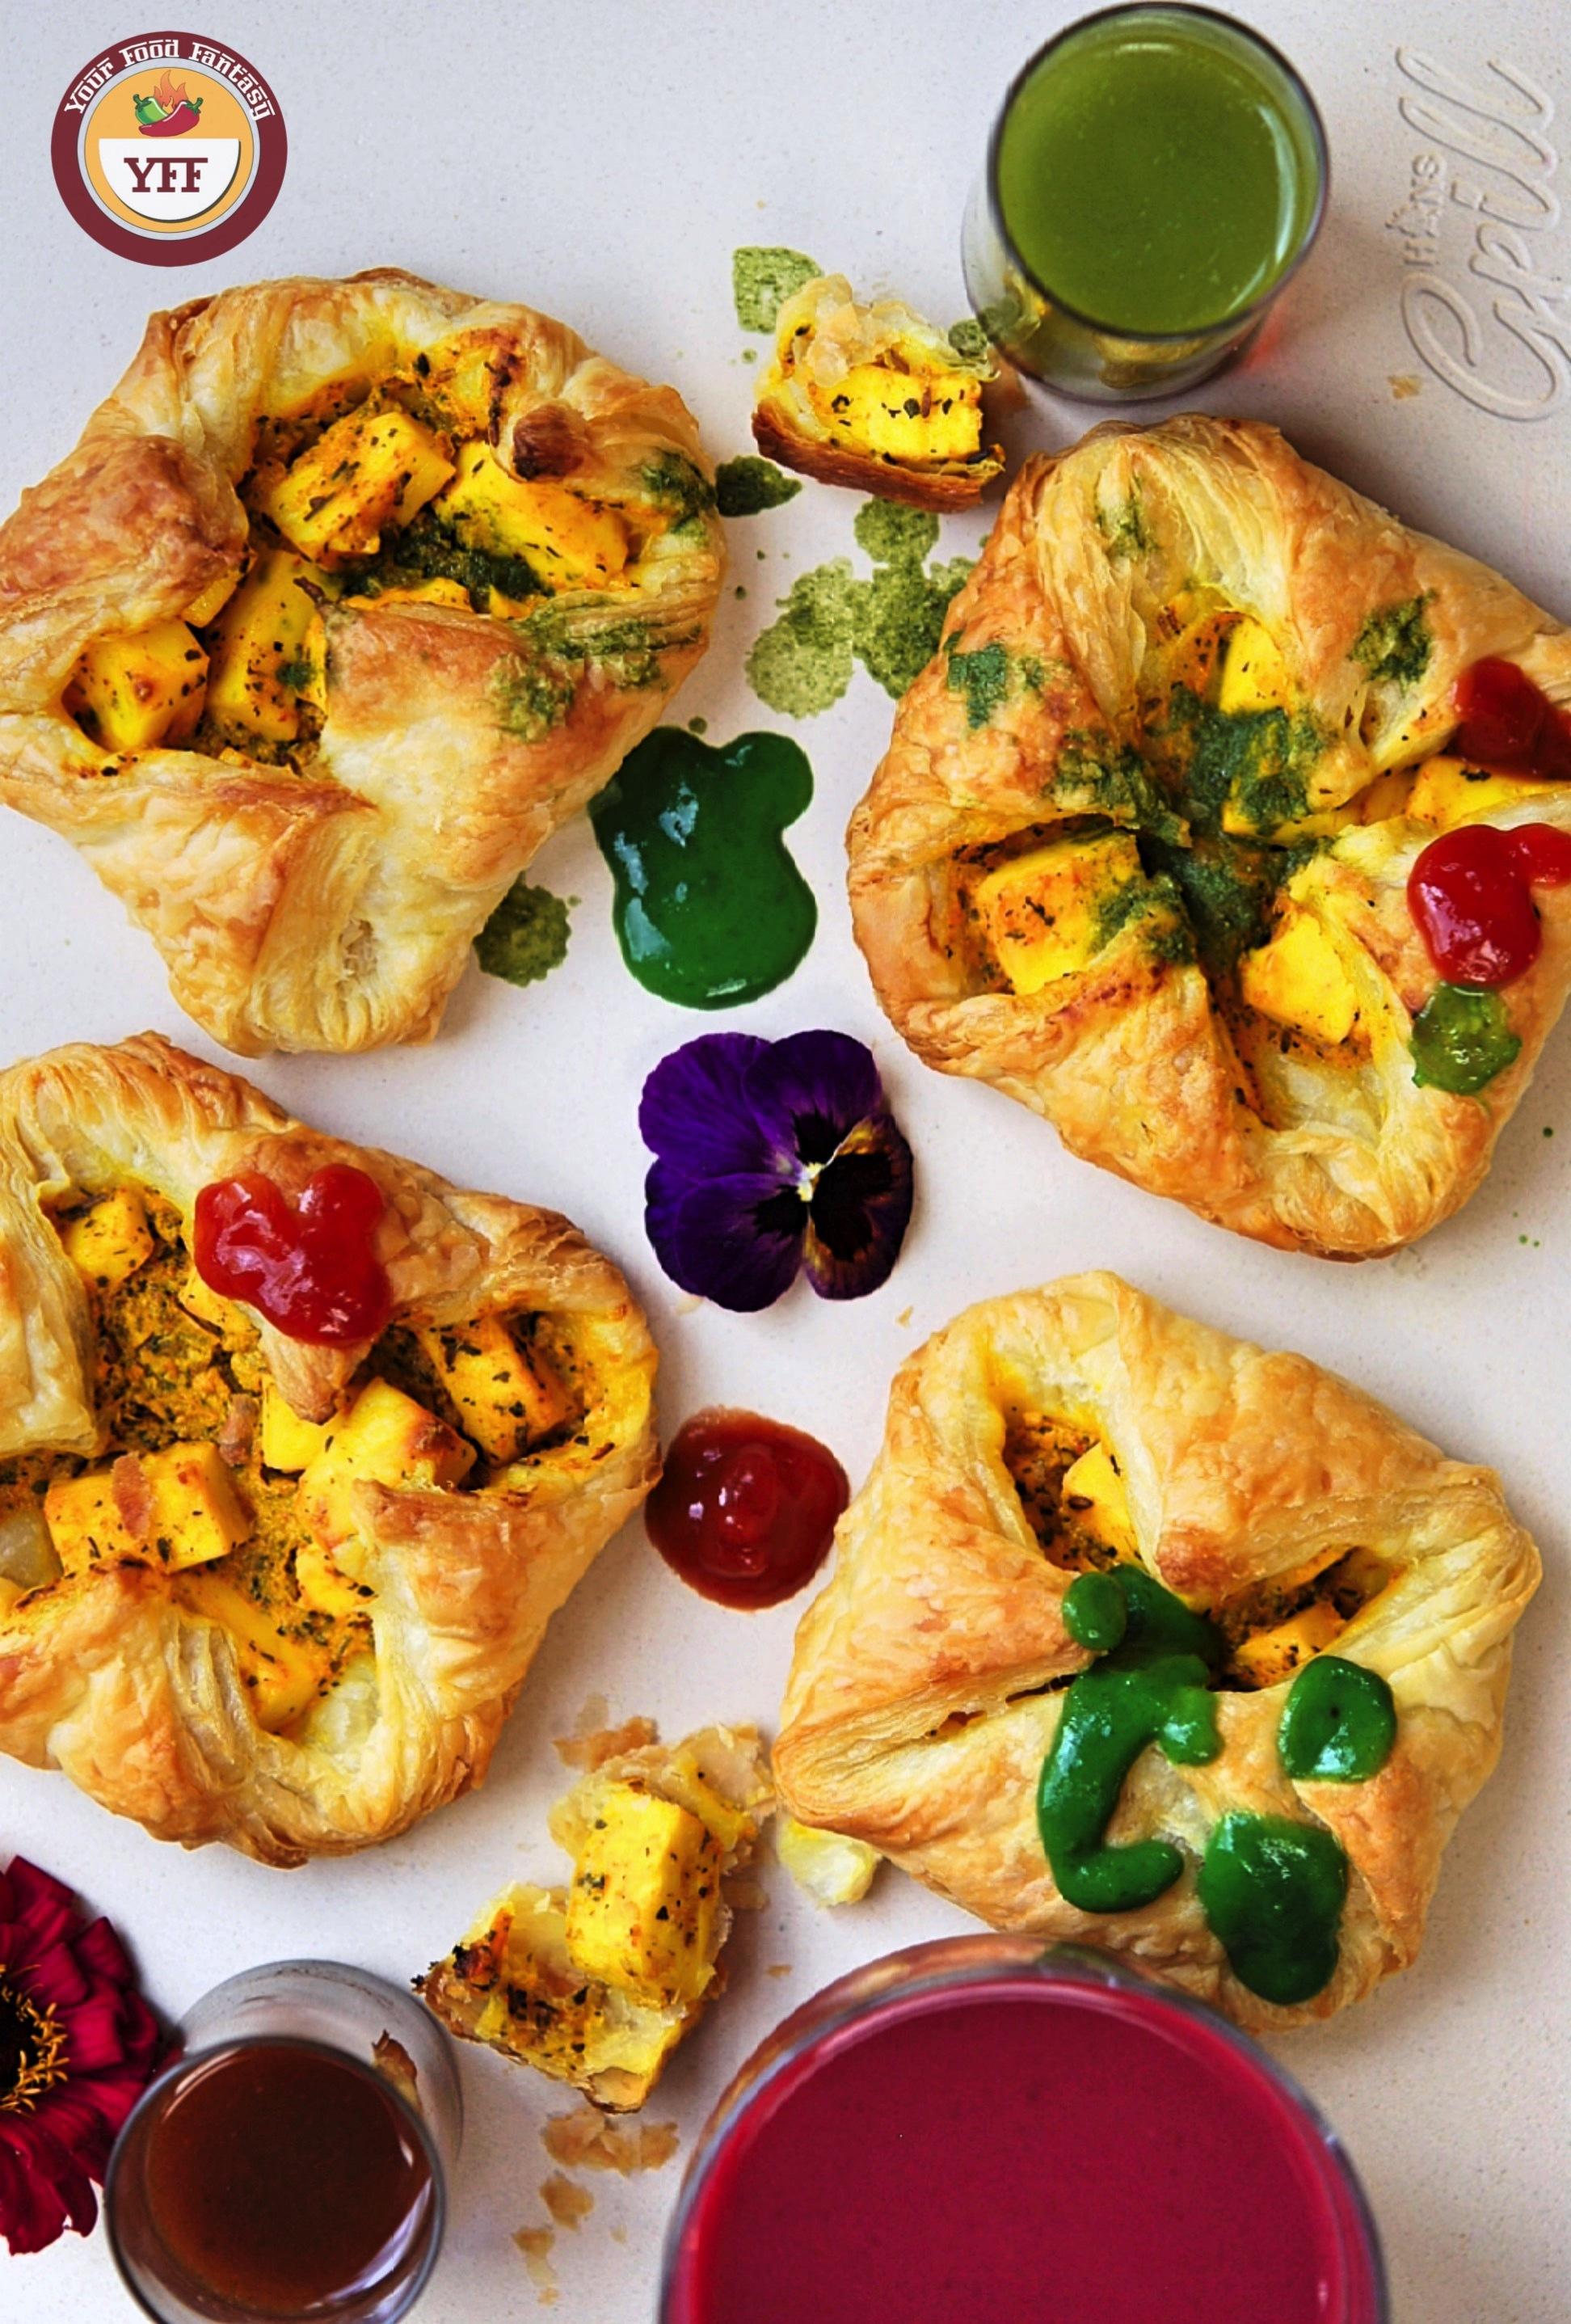 Paneer Tikka Pockets - Paneer Tikka Parcels   Paneer Recipes - YourFoodFantasy.com